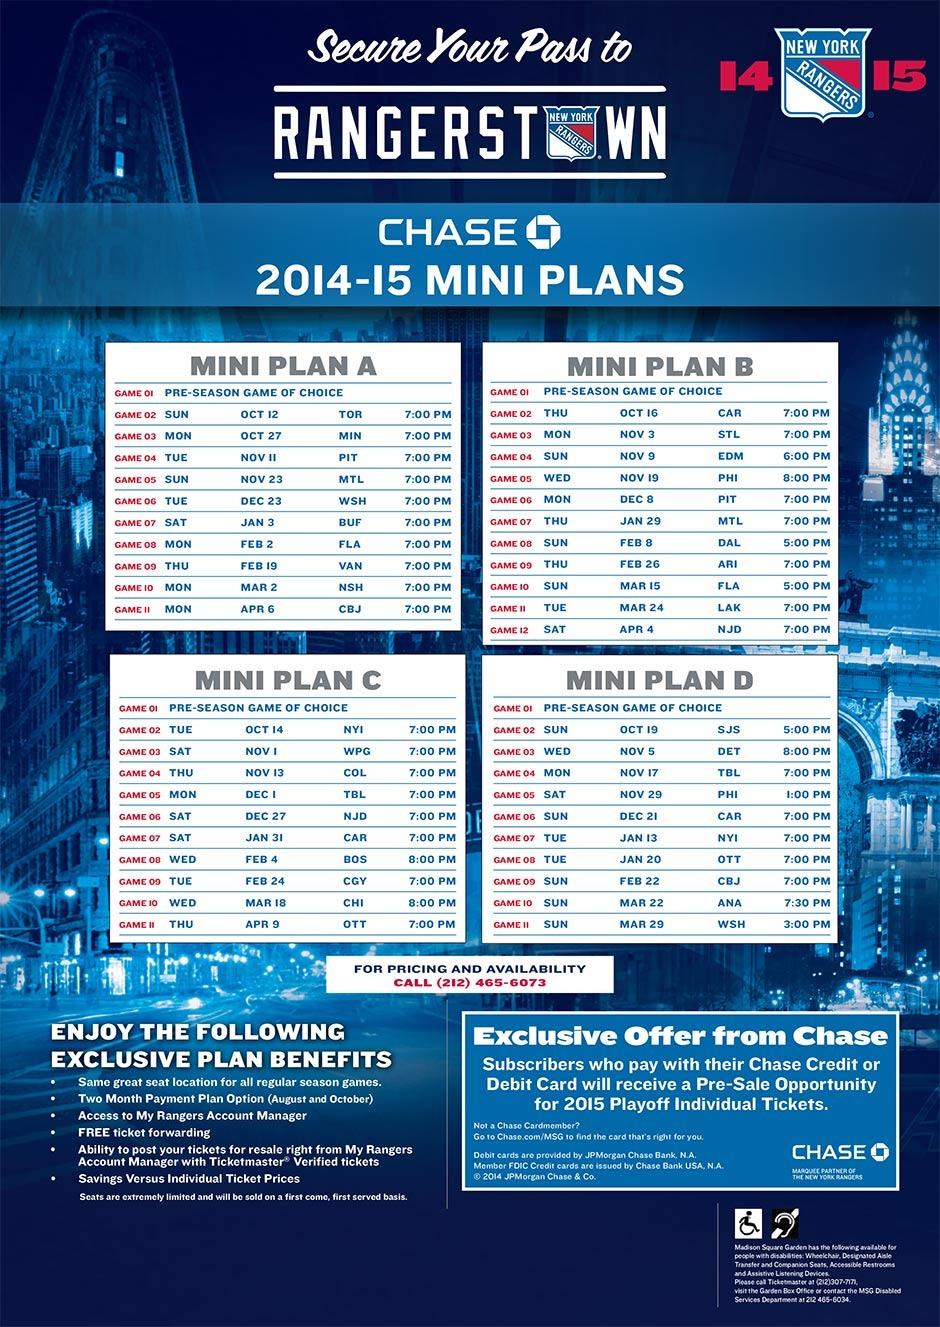 photograph regarding New York Rangers Printable Schedule called 49+] Fresh new York Rangers Program Wallpaper upon WallpaperSafari